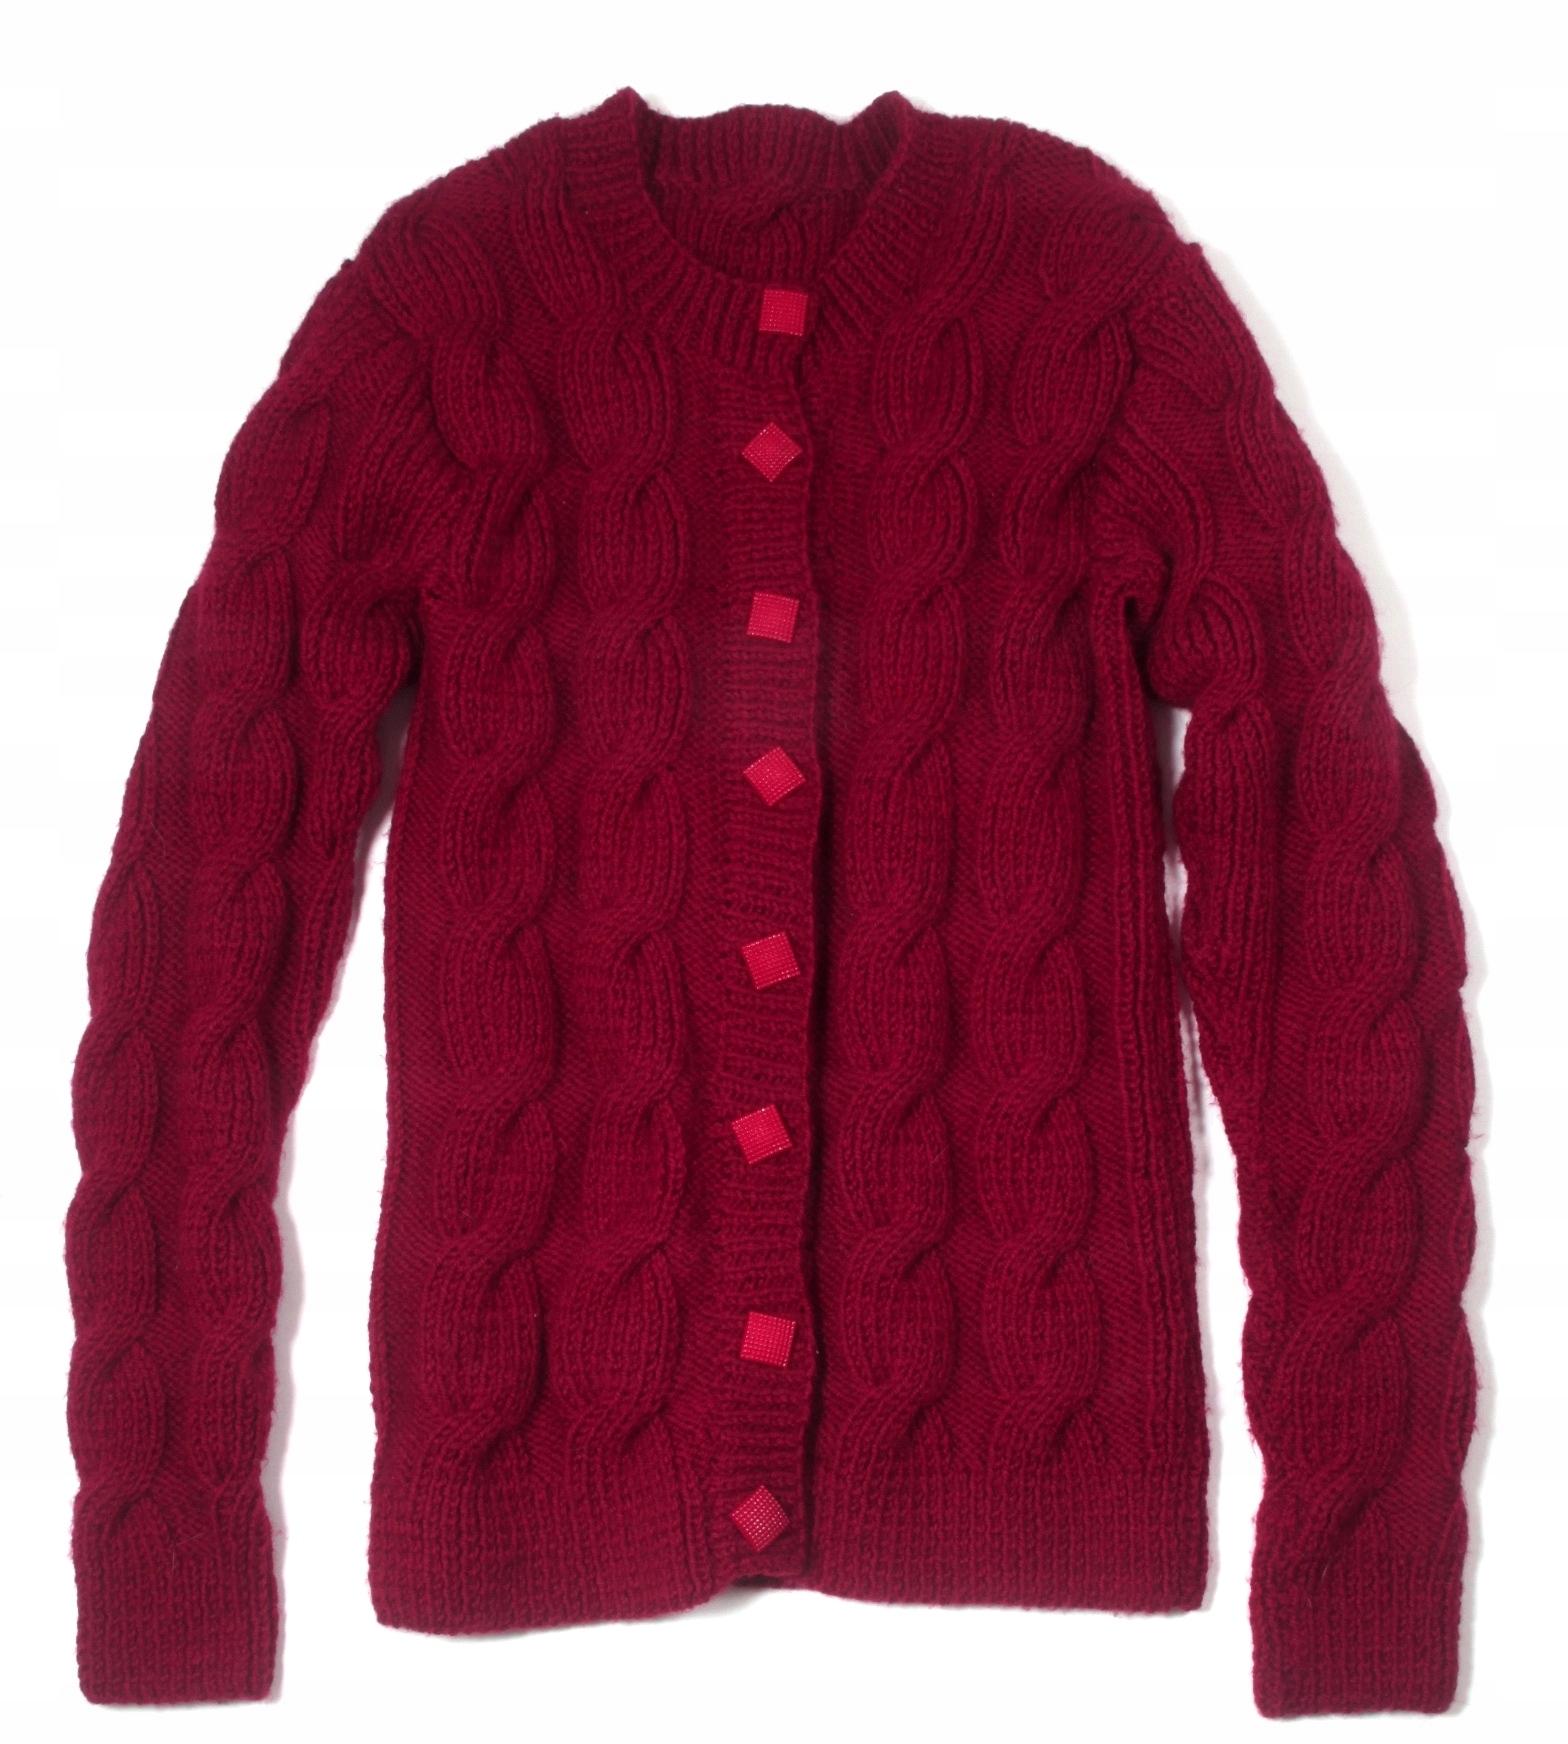 HAND MADE sweter w warkocze BORDO S/M